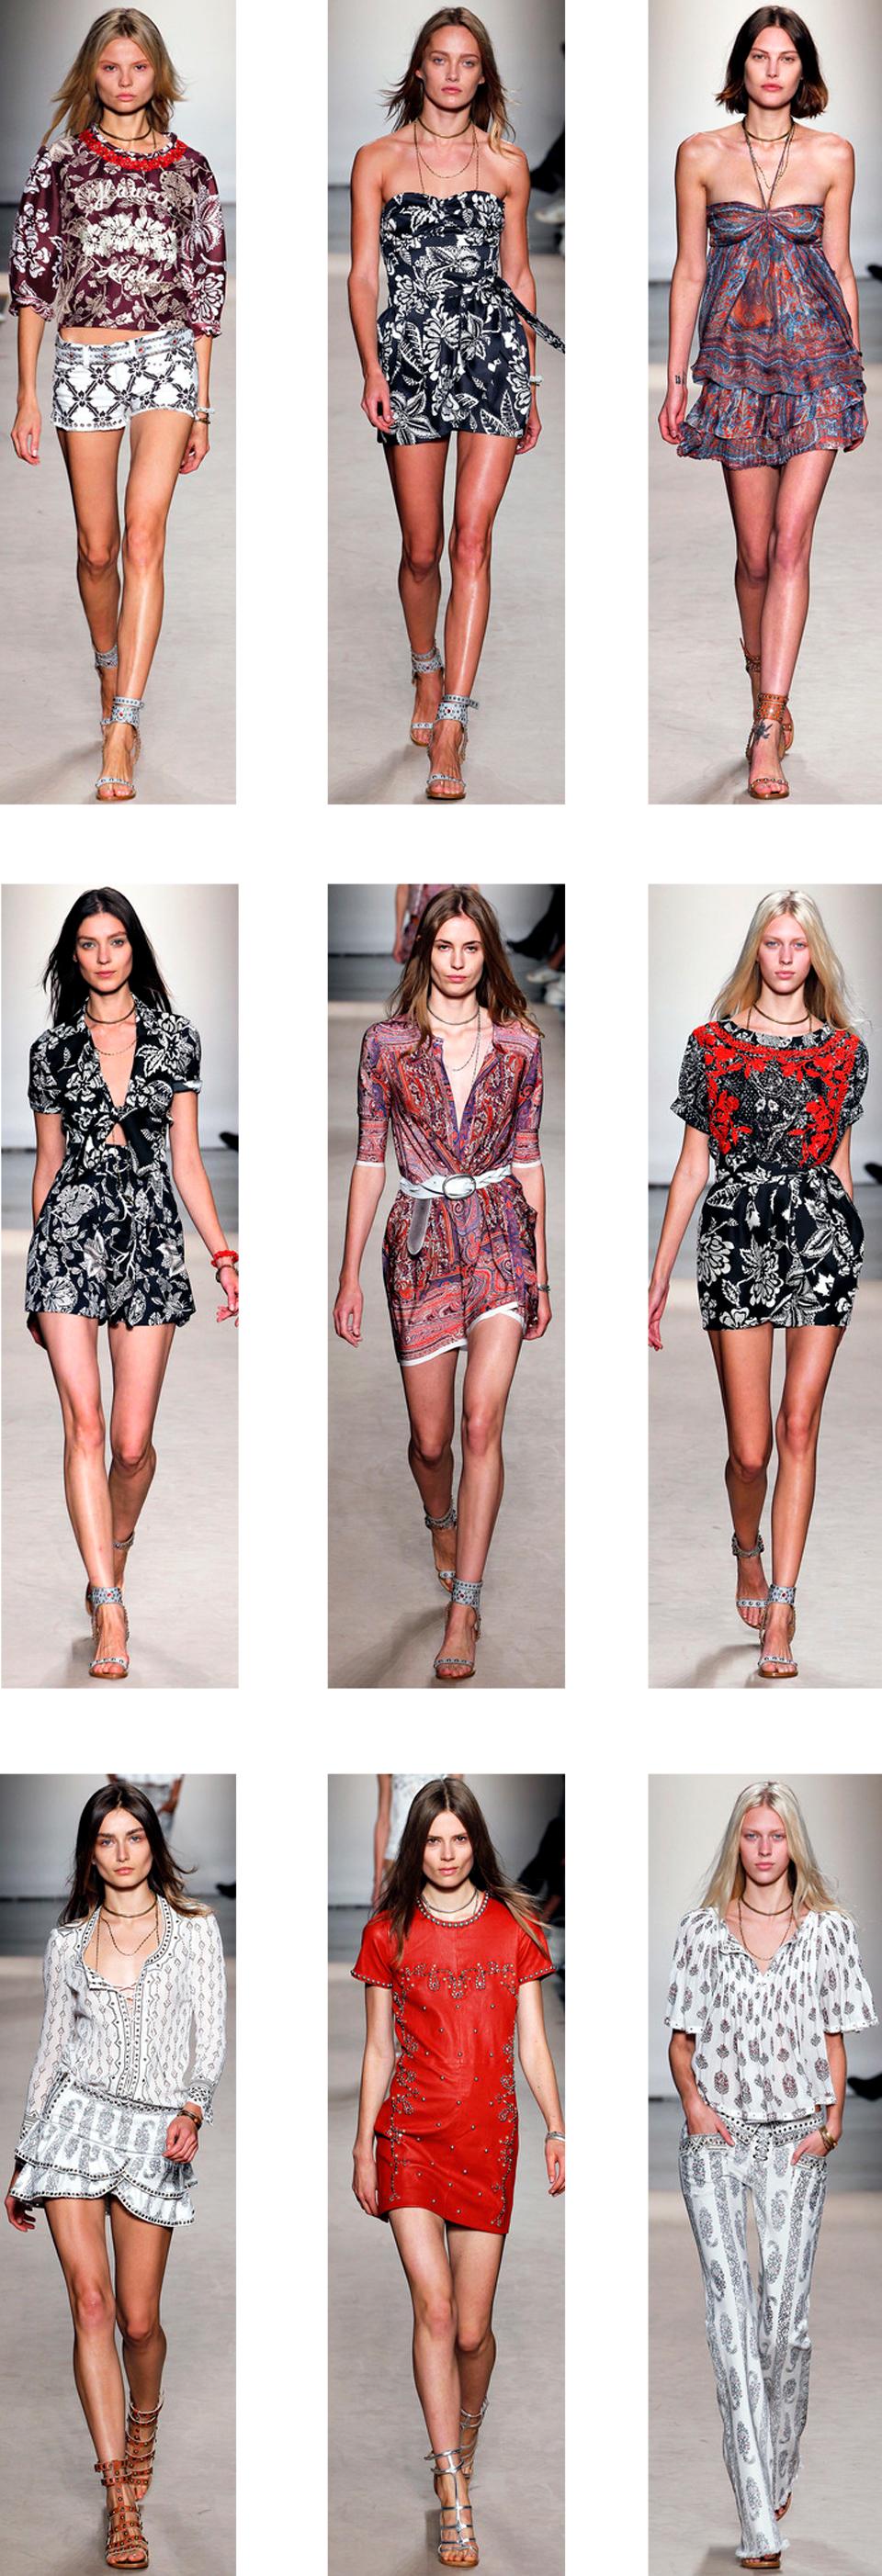 All images via  www.style.com